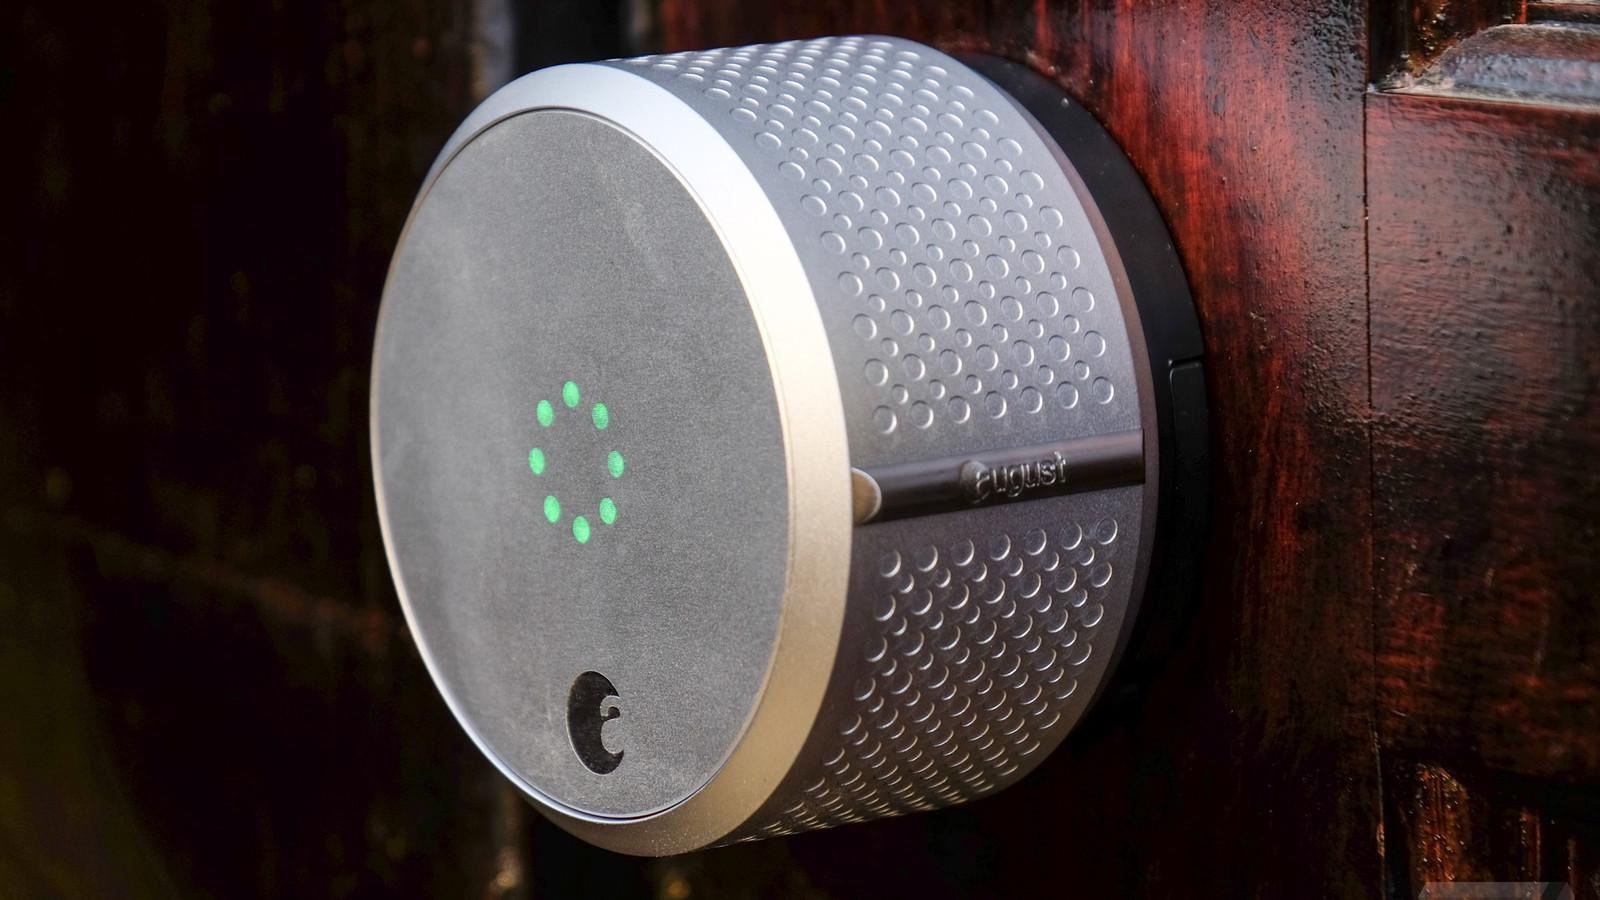 Amazon S Alexa Will Now Lock Your Door For You If You